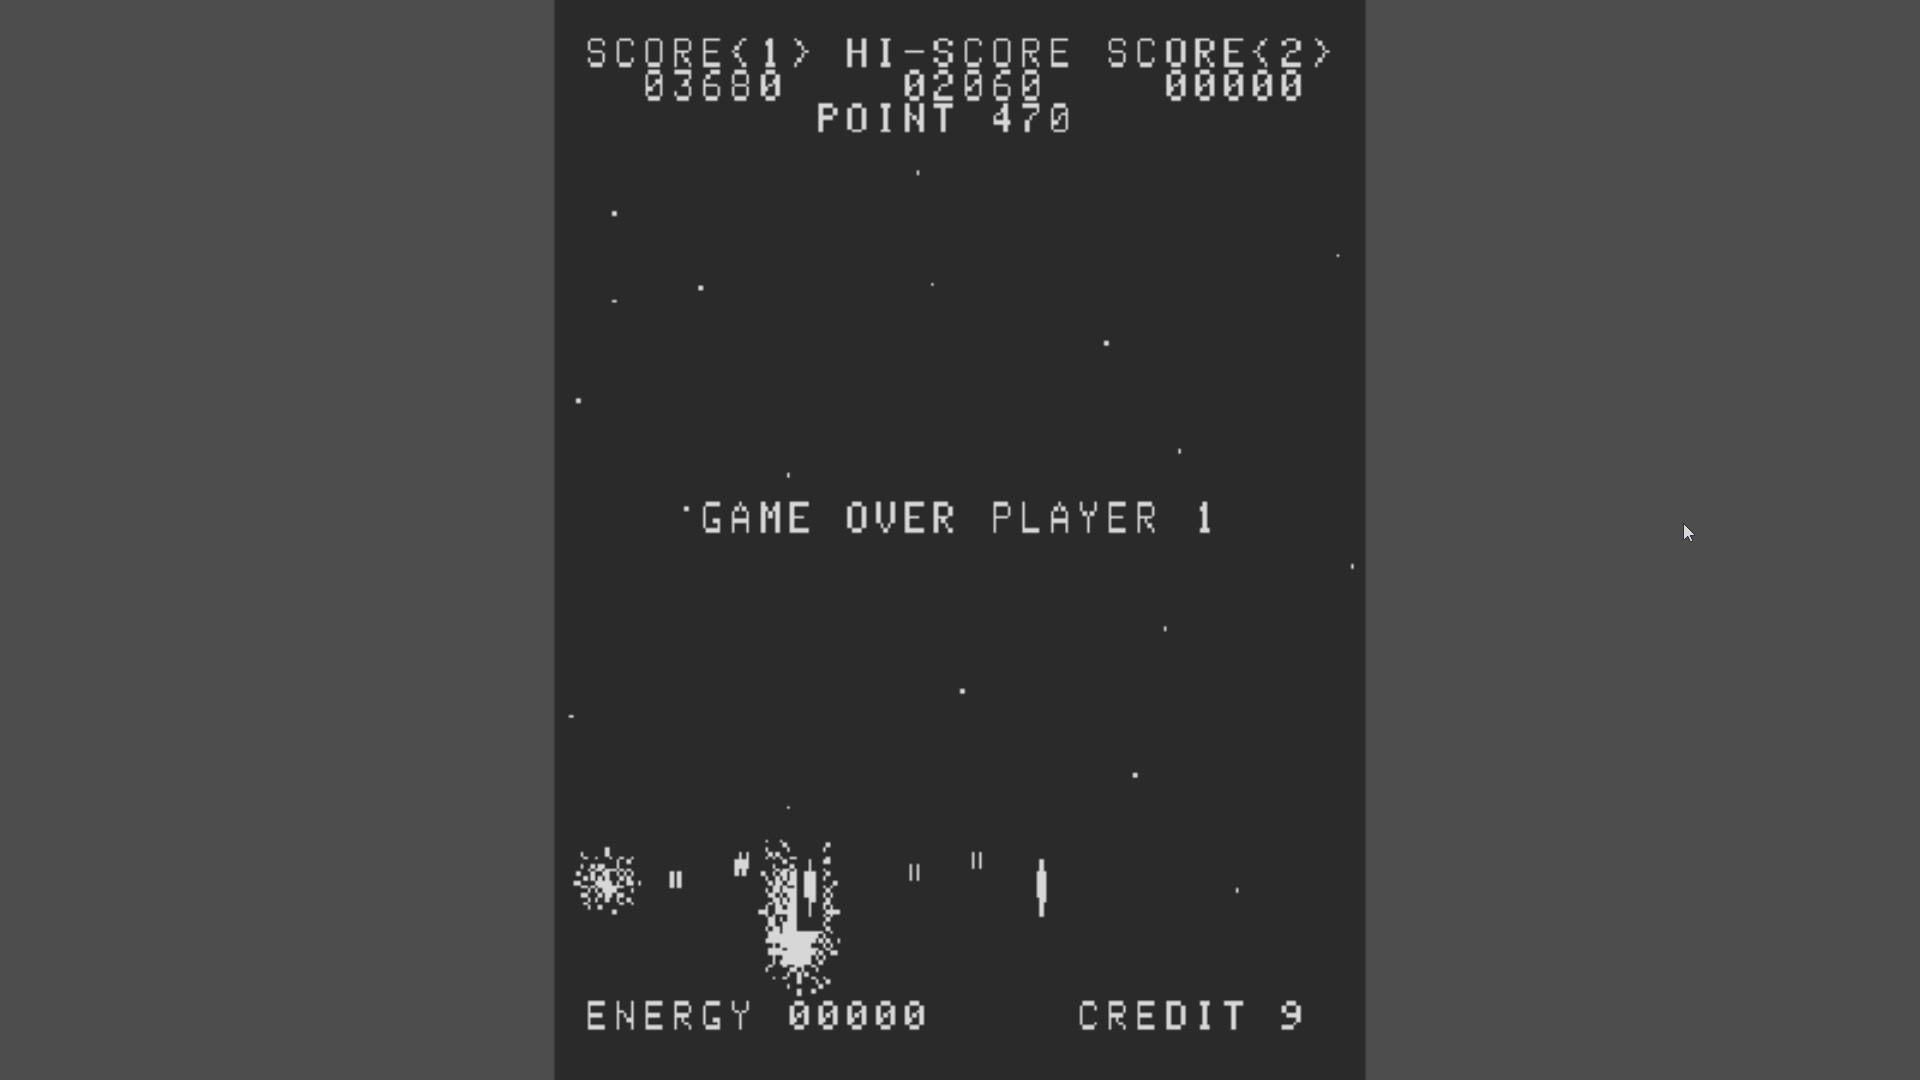 AkinNahtanoj: Ozma Wars [ozmawars] (Arcade Emulated / M.A.M.E.) 3,680 points on 2020-10-18 02:54:03